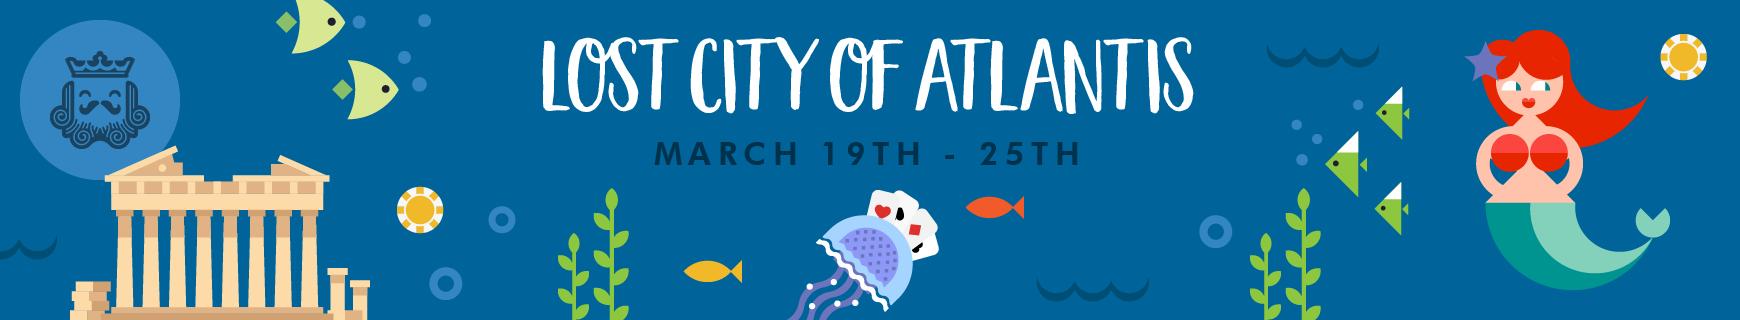 Lost city of atlantis %28870 x 160%29 2x %282%29